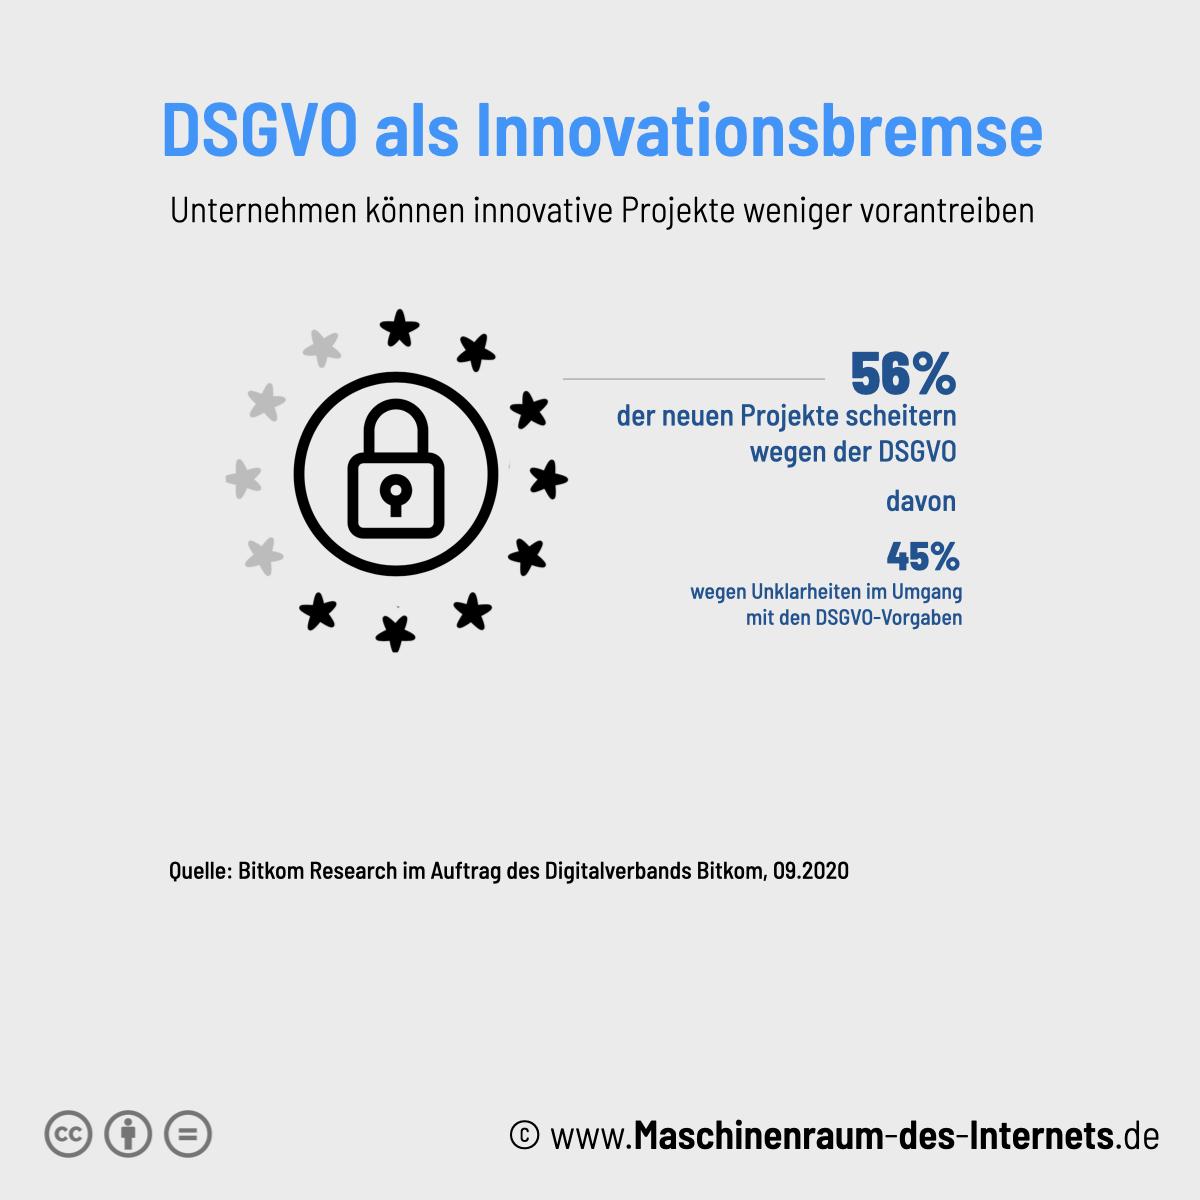 Maschinenraum des Internets ++ DSGVO als Innovationsbremse